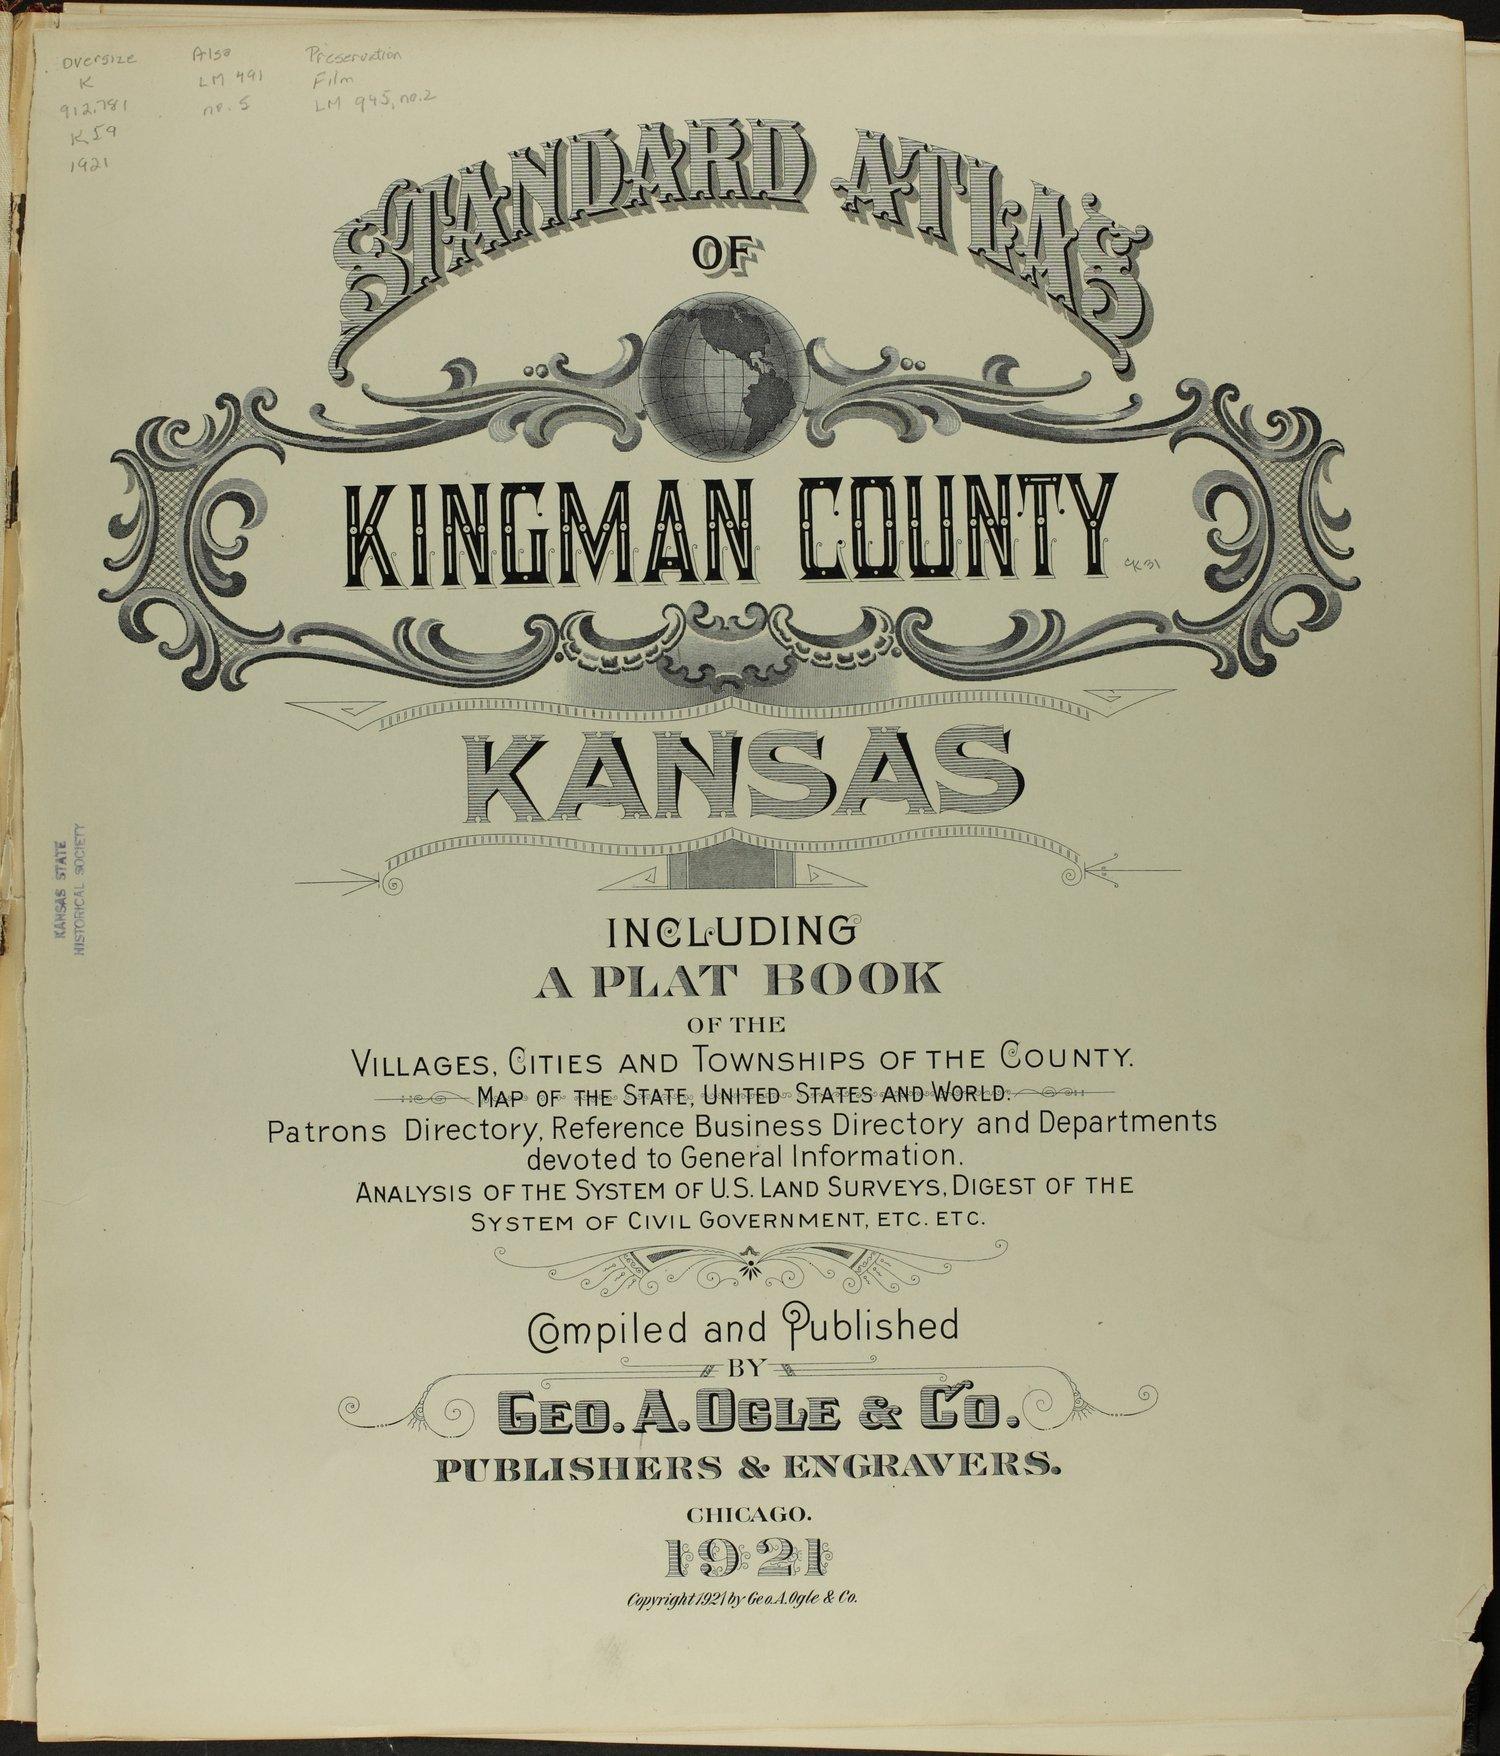 Standard atlas of Kingman County, Kansas - Title Page